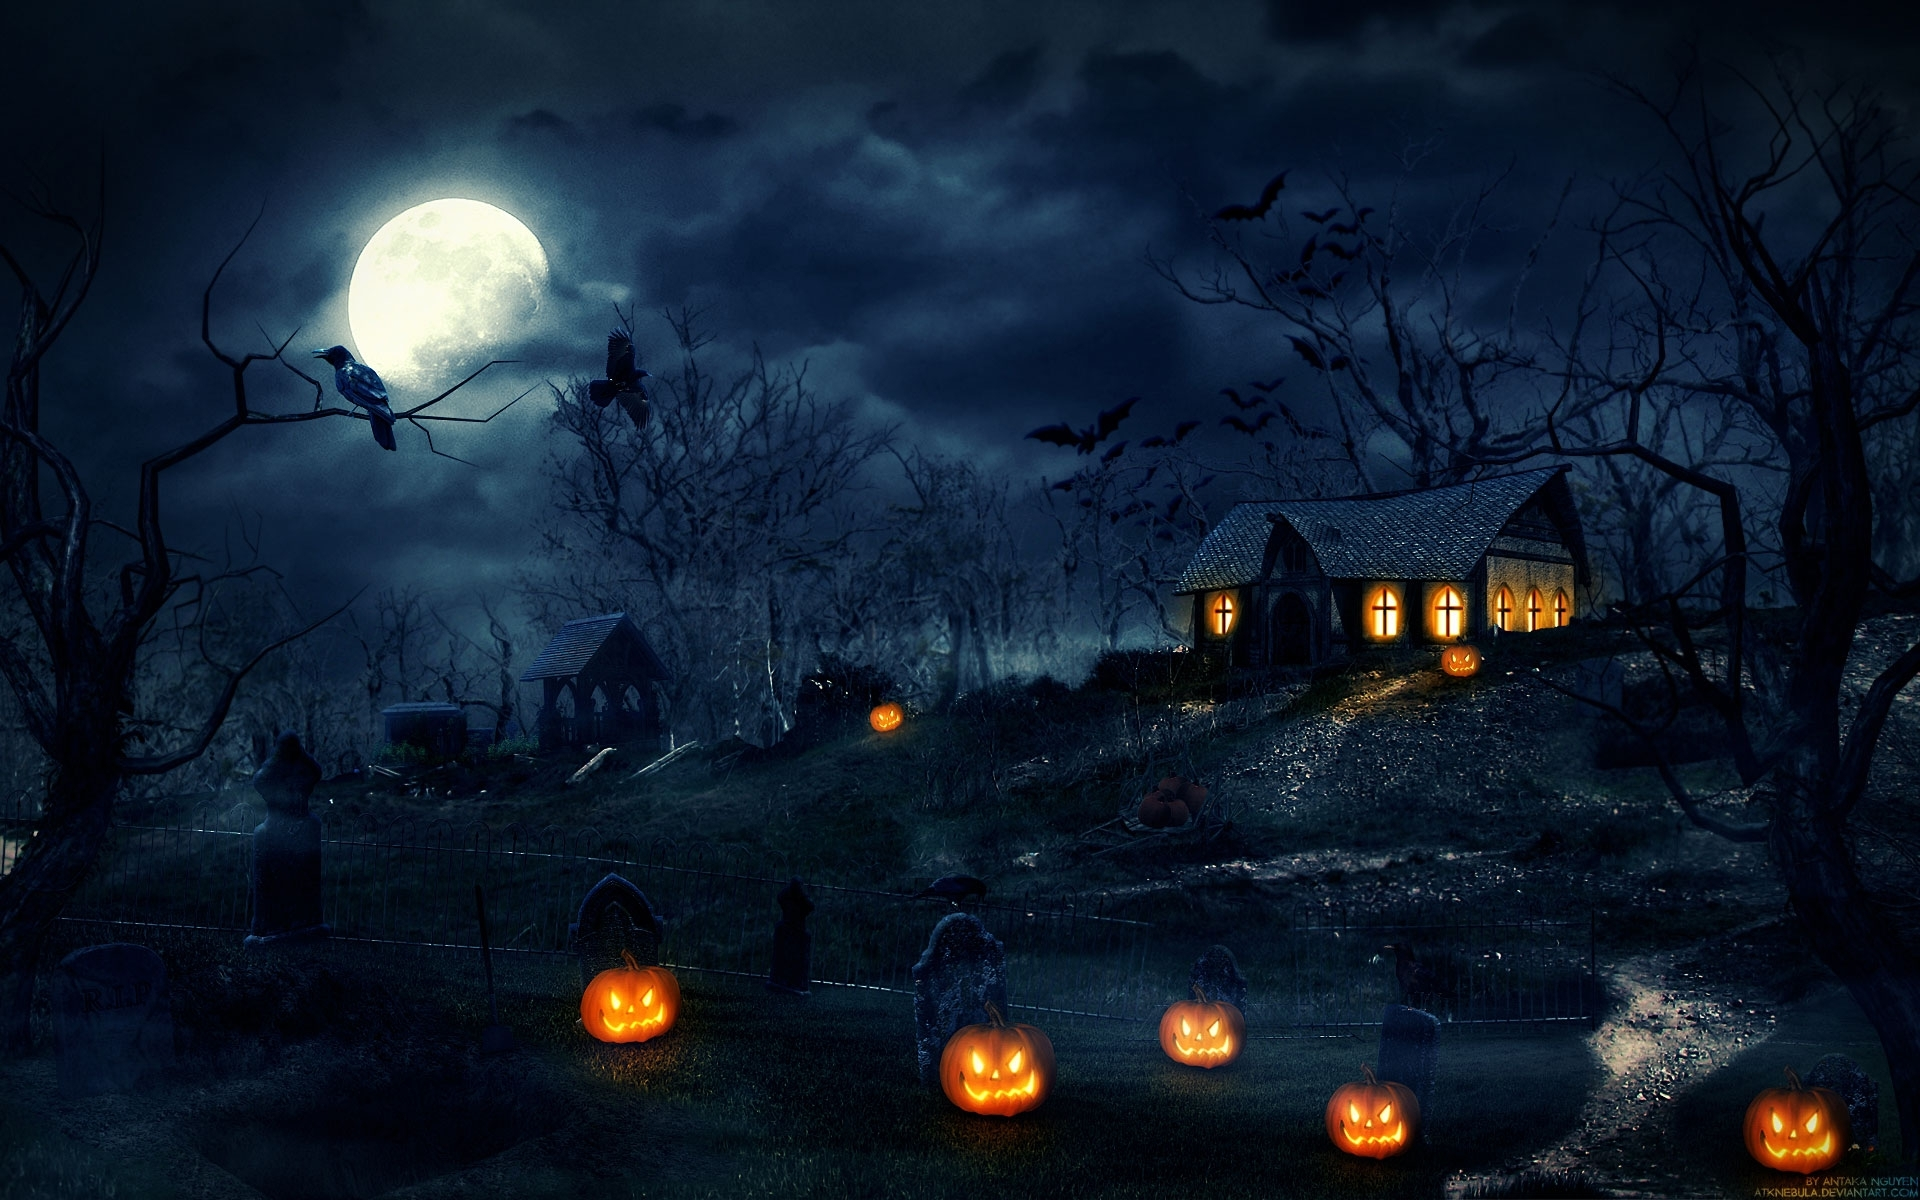 scary halloween hd backgrounds. - media file | pixelstalk